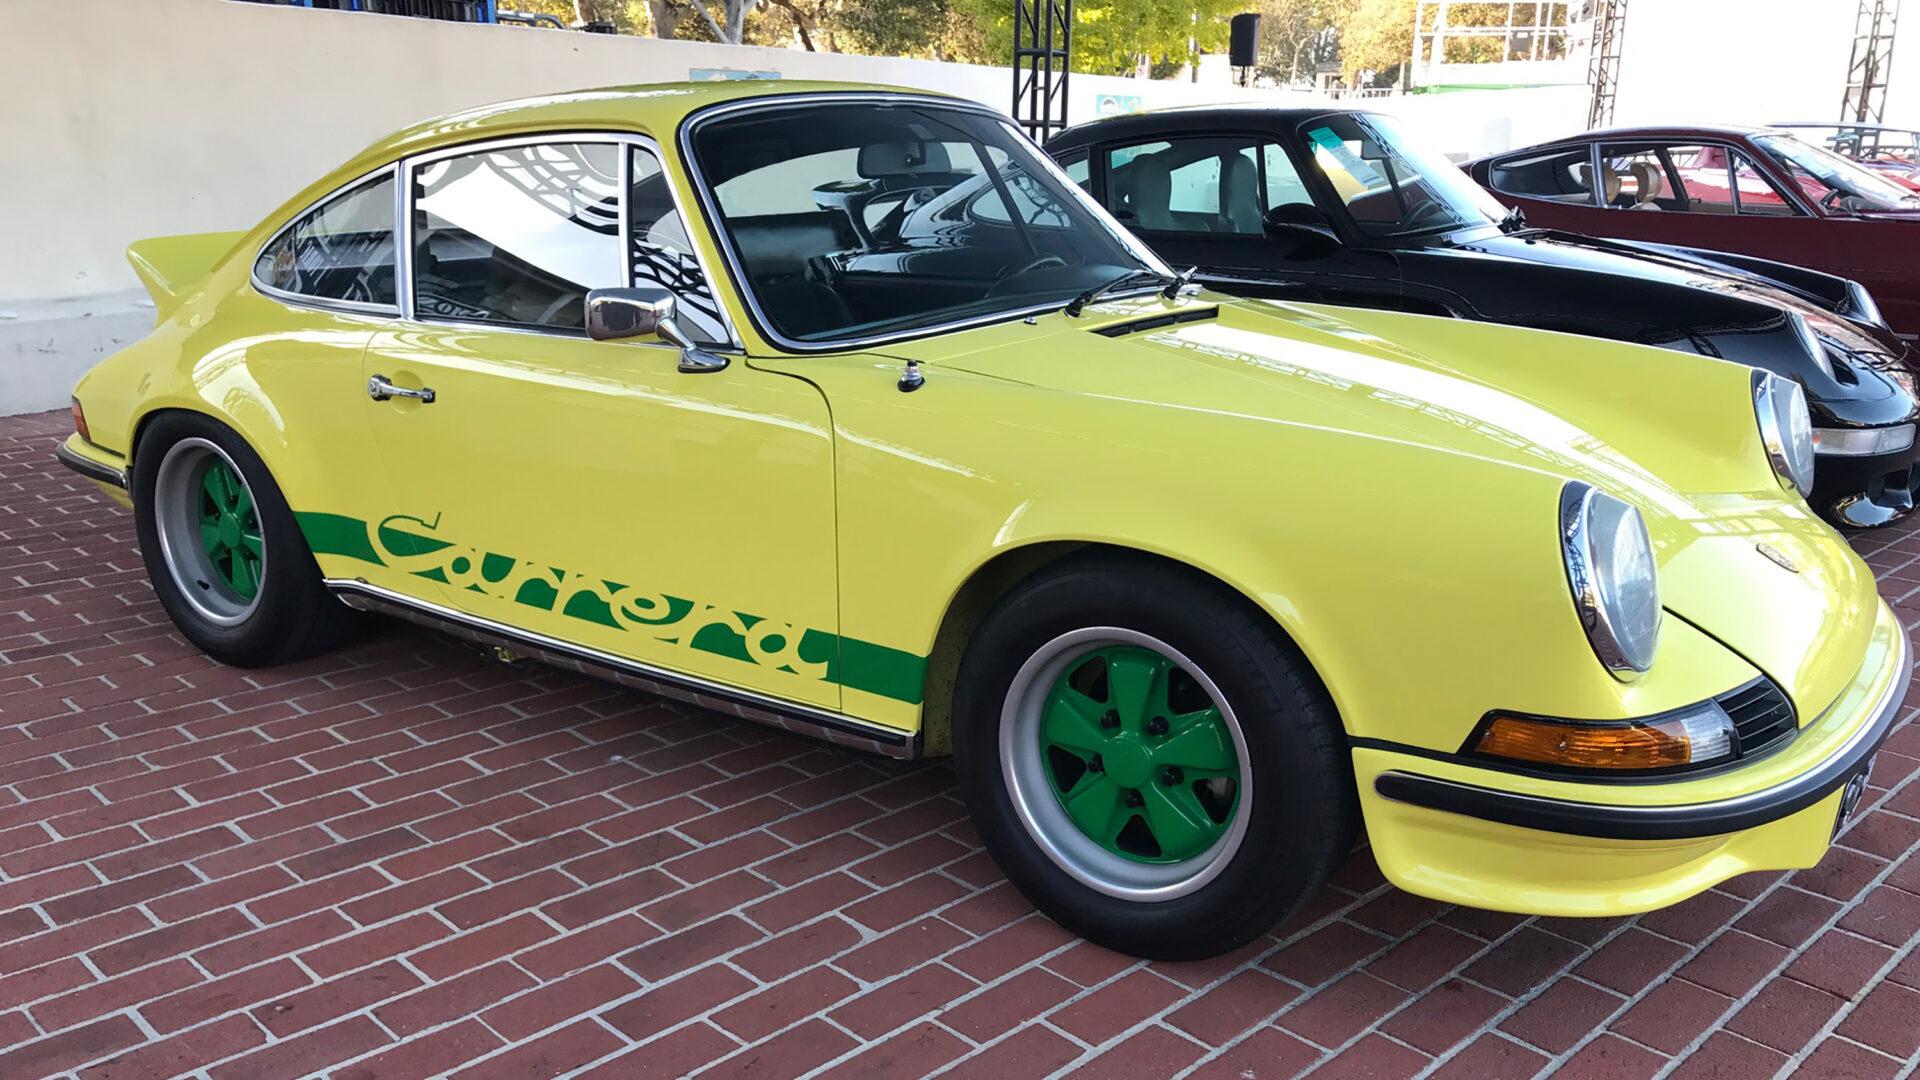 A Porsche Carrera